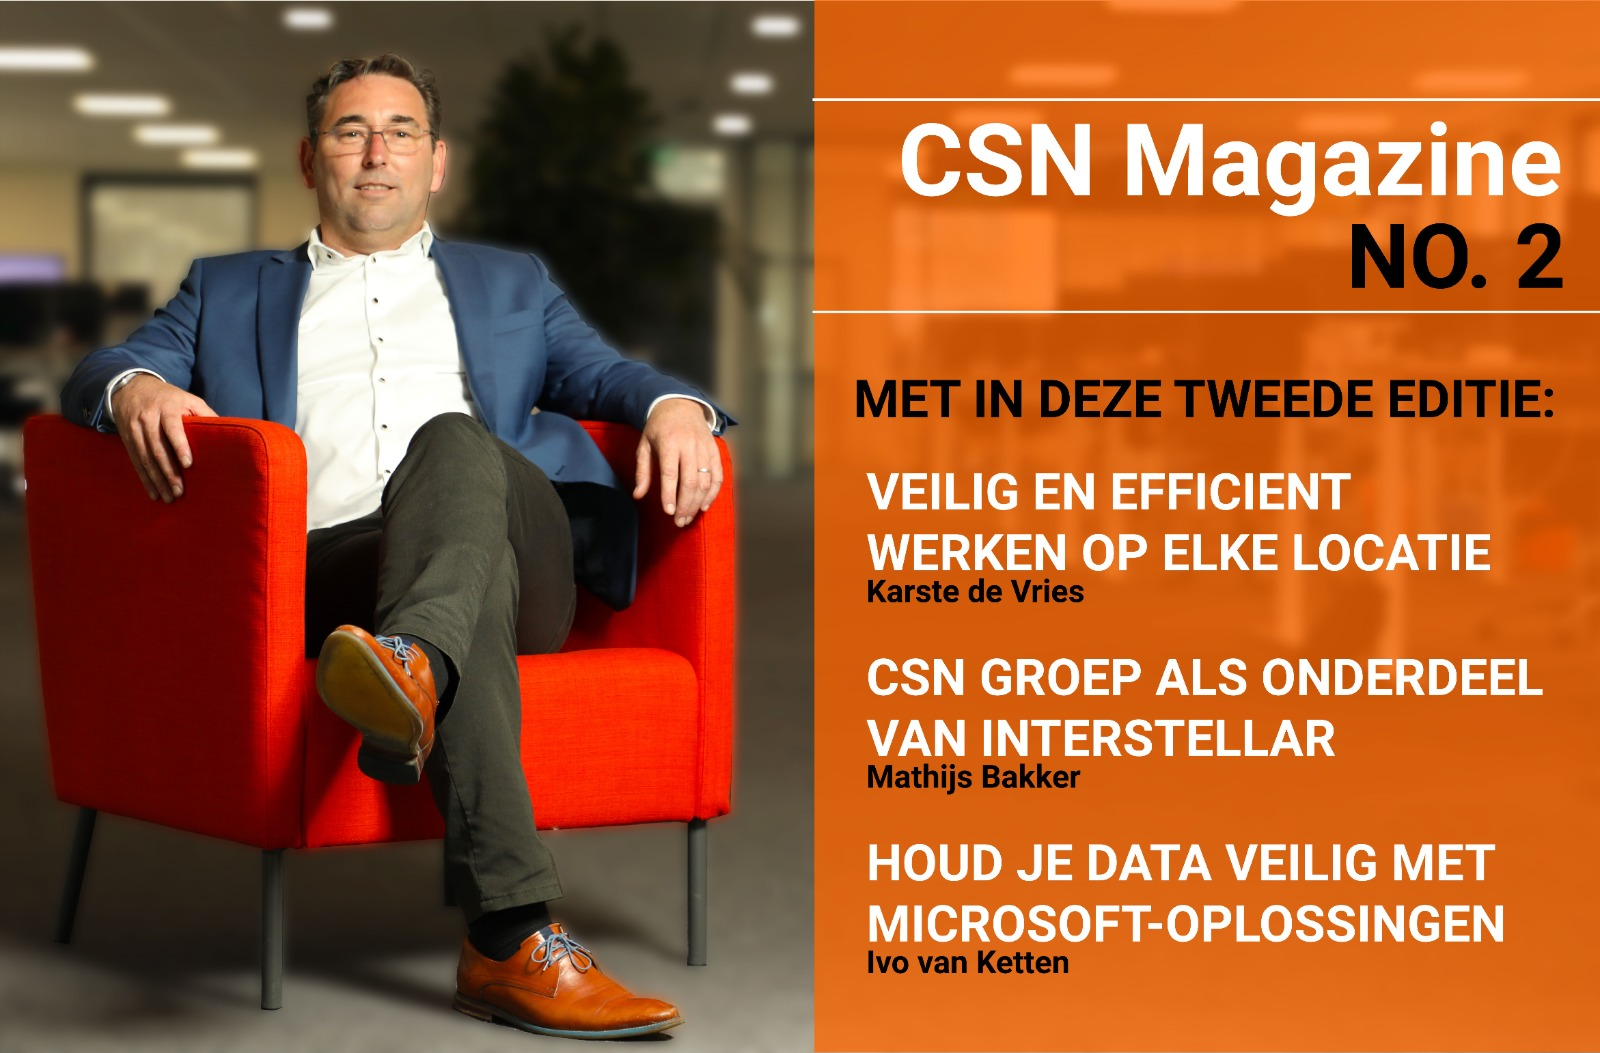 CSN Magazine Karste